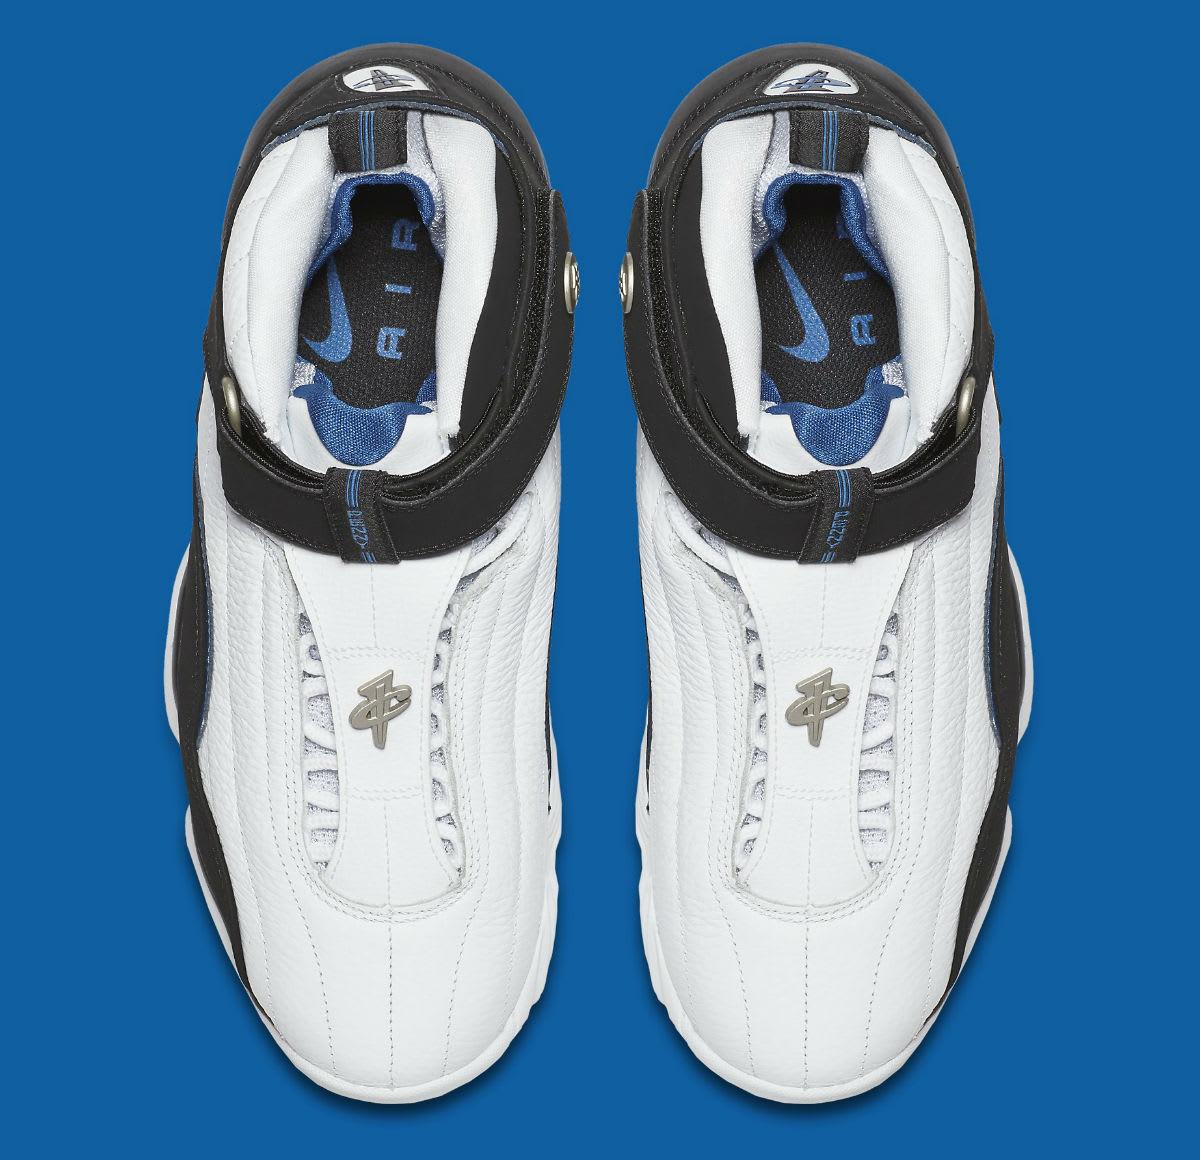 Nike Air Penny 4 OG White Black Blue Release Date Top 864018-100